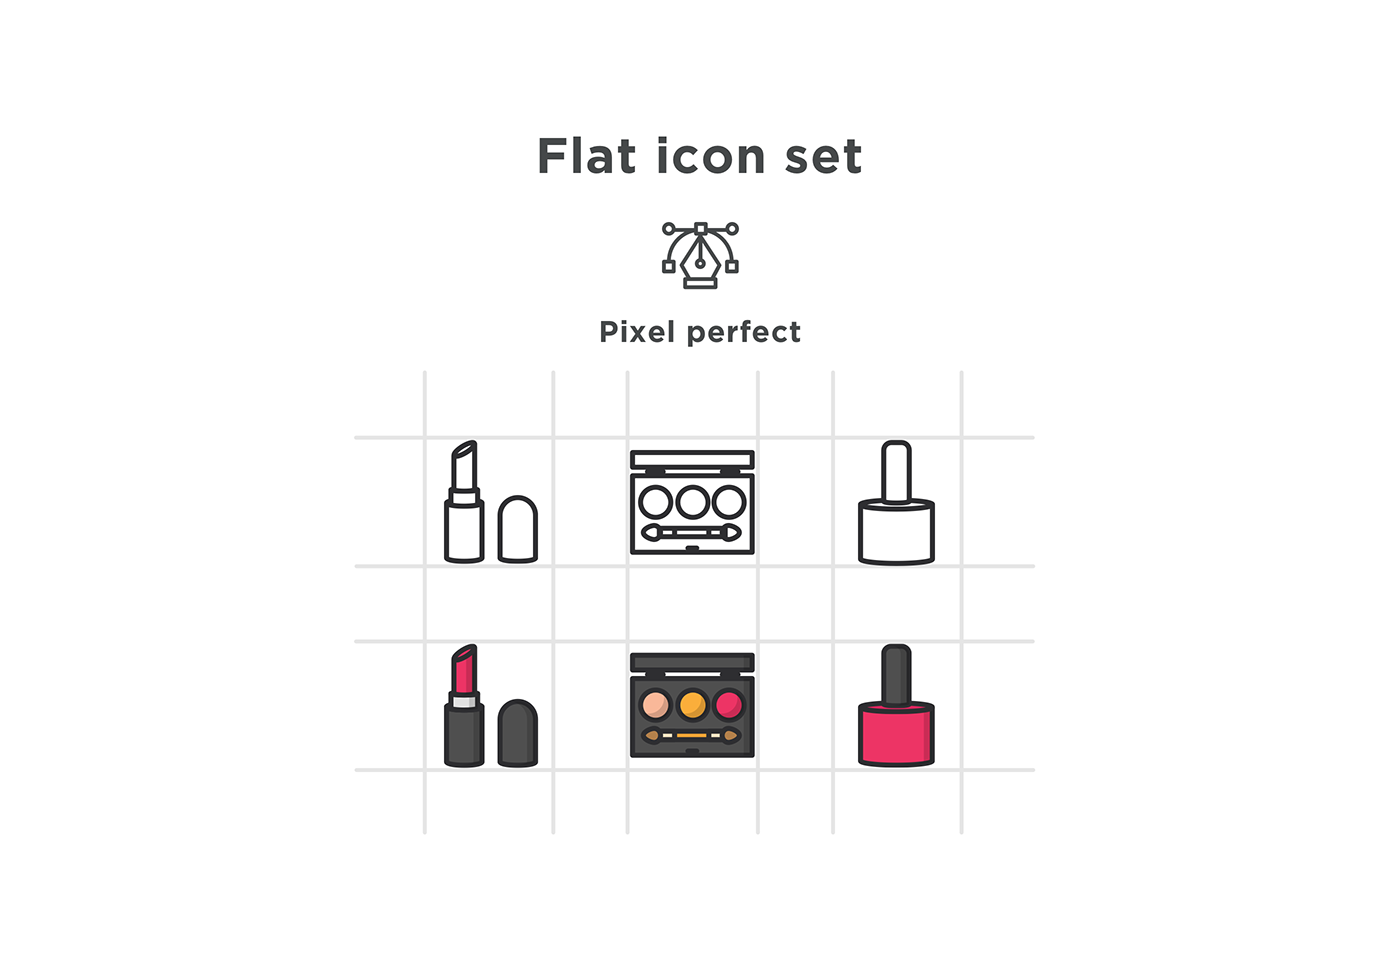 free icons free download Icon flat Cosmetic free icon lipstick mirror foundation